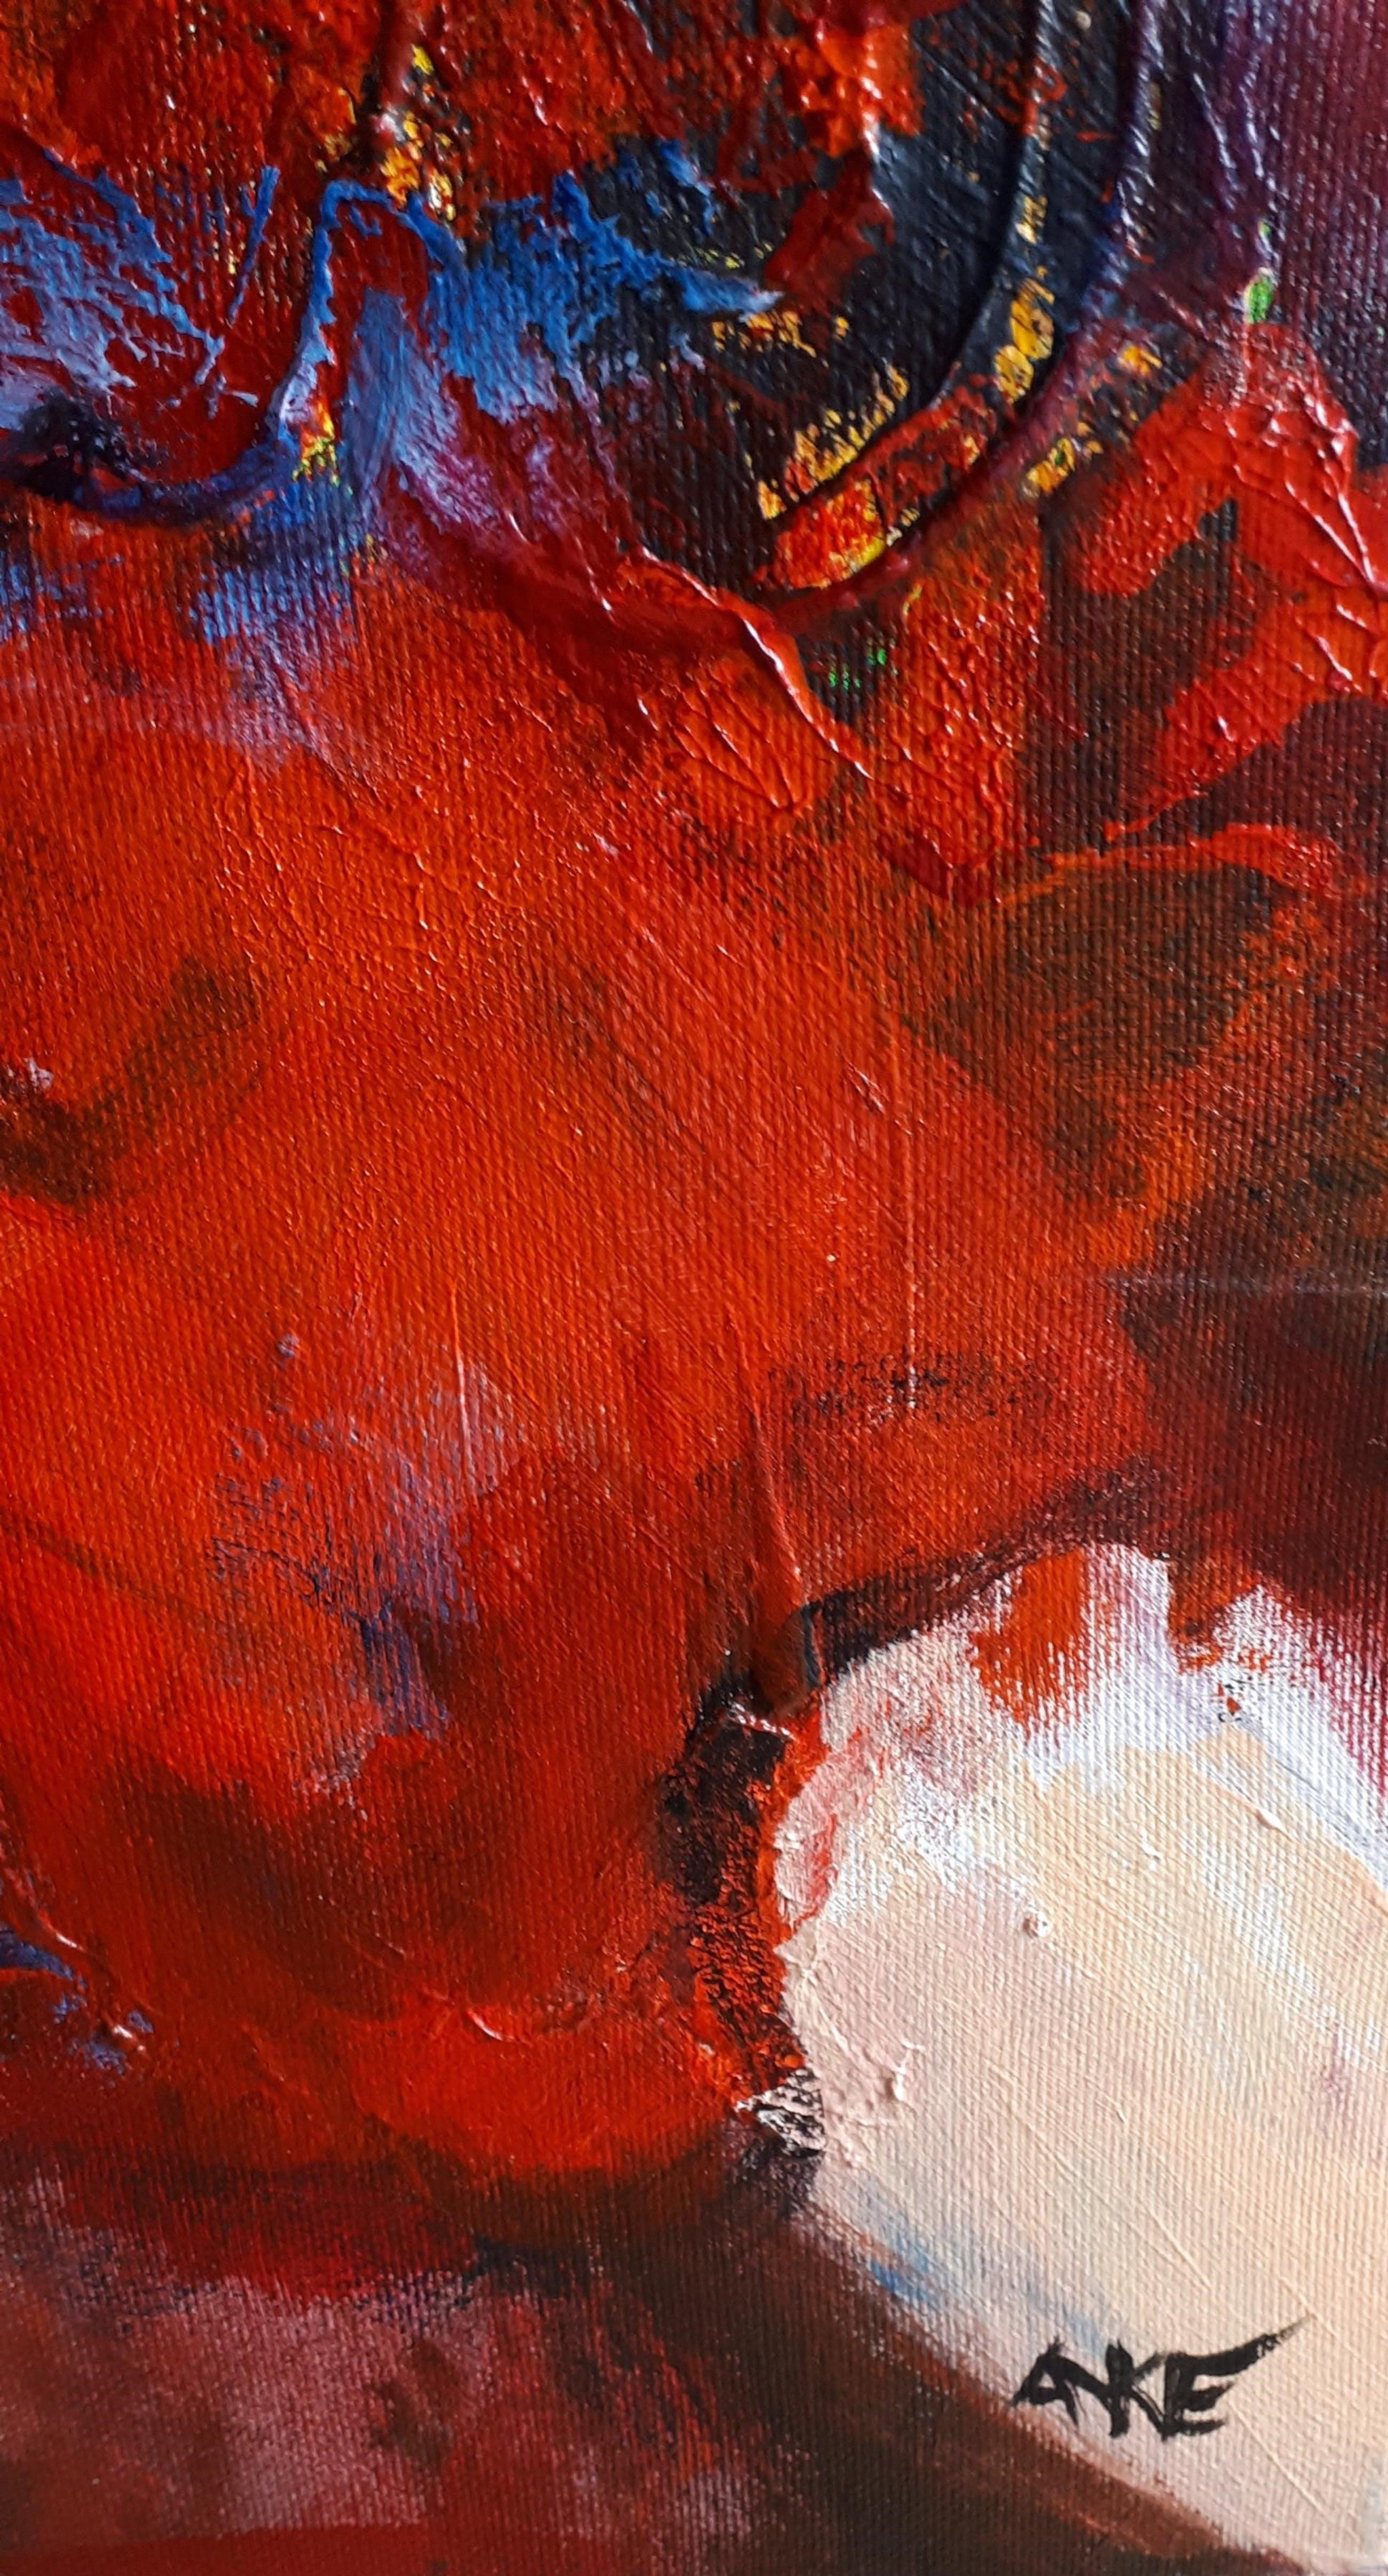 Anke Peddemors - flamenco rood 80x100 kopen? Bied vanaf 75!